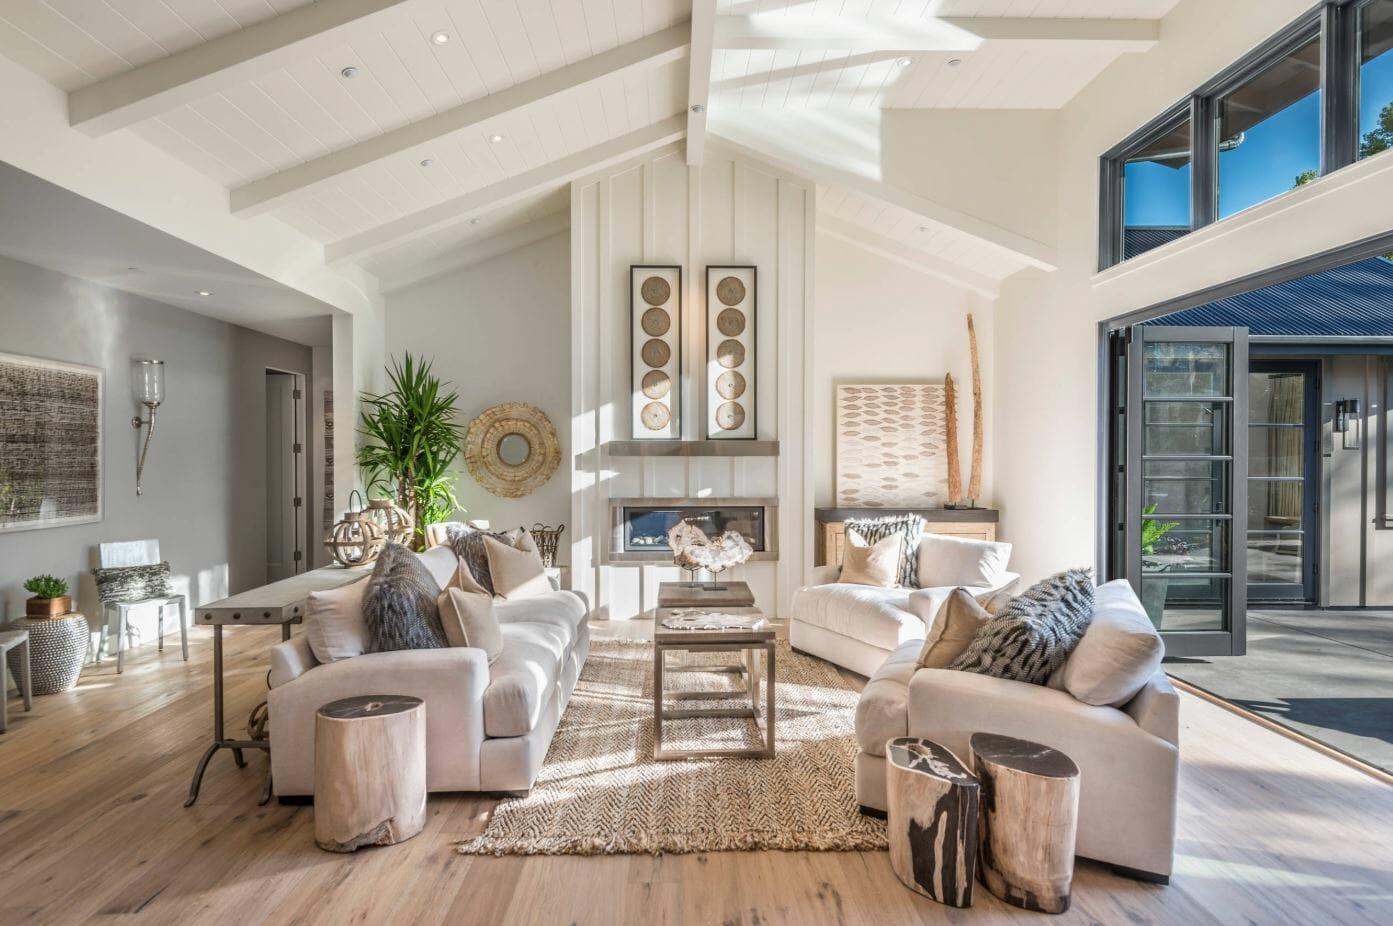 decorist vs decorilla neutral living room feature